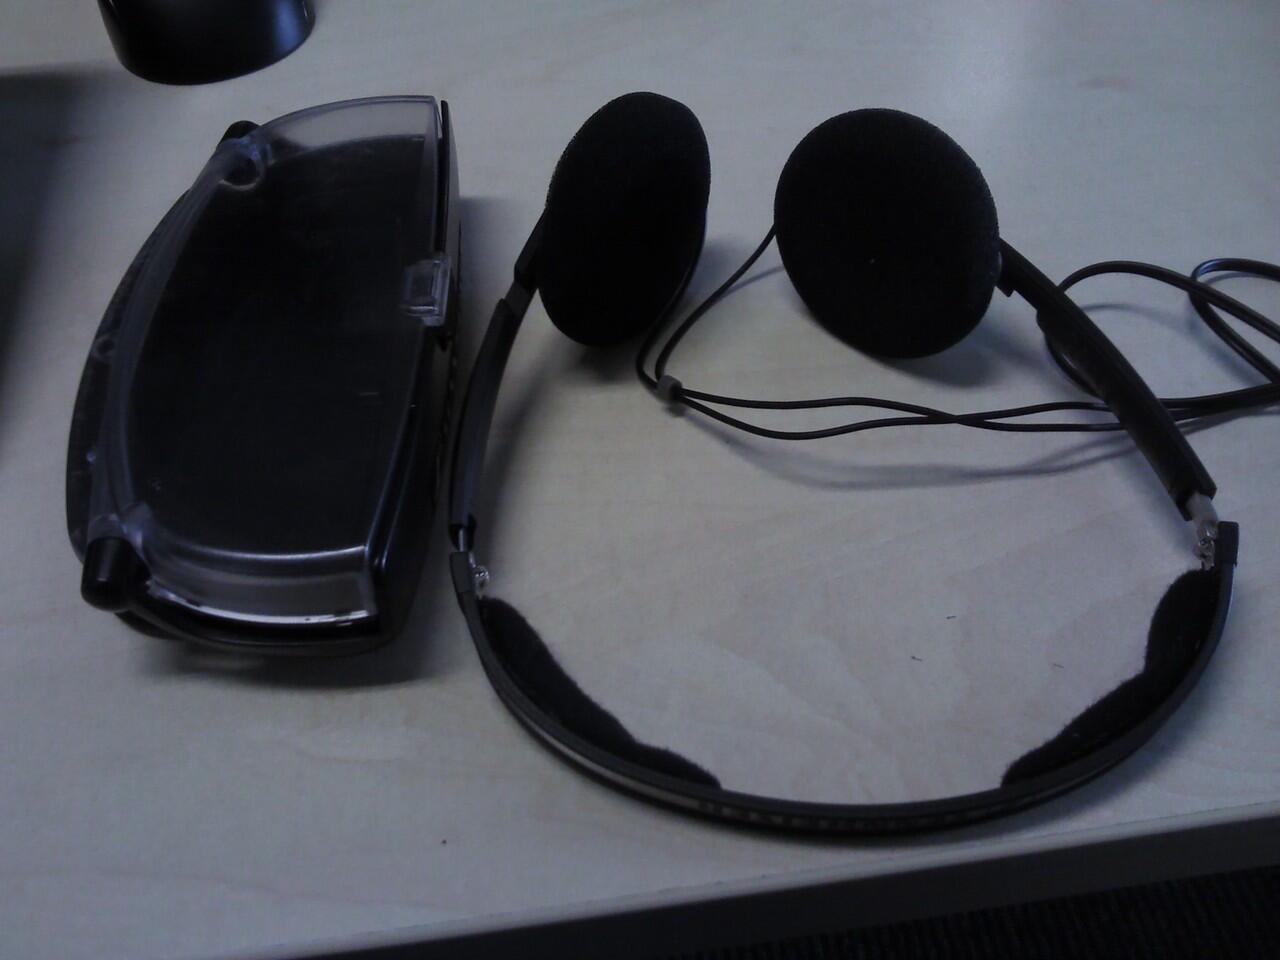 Jual Sennheiser PX100 ( Seri Pertama ) Suara Ajib,Barang langka Abisssss